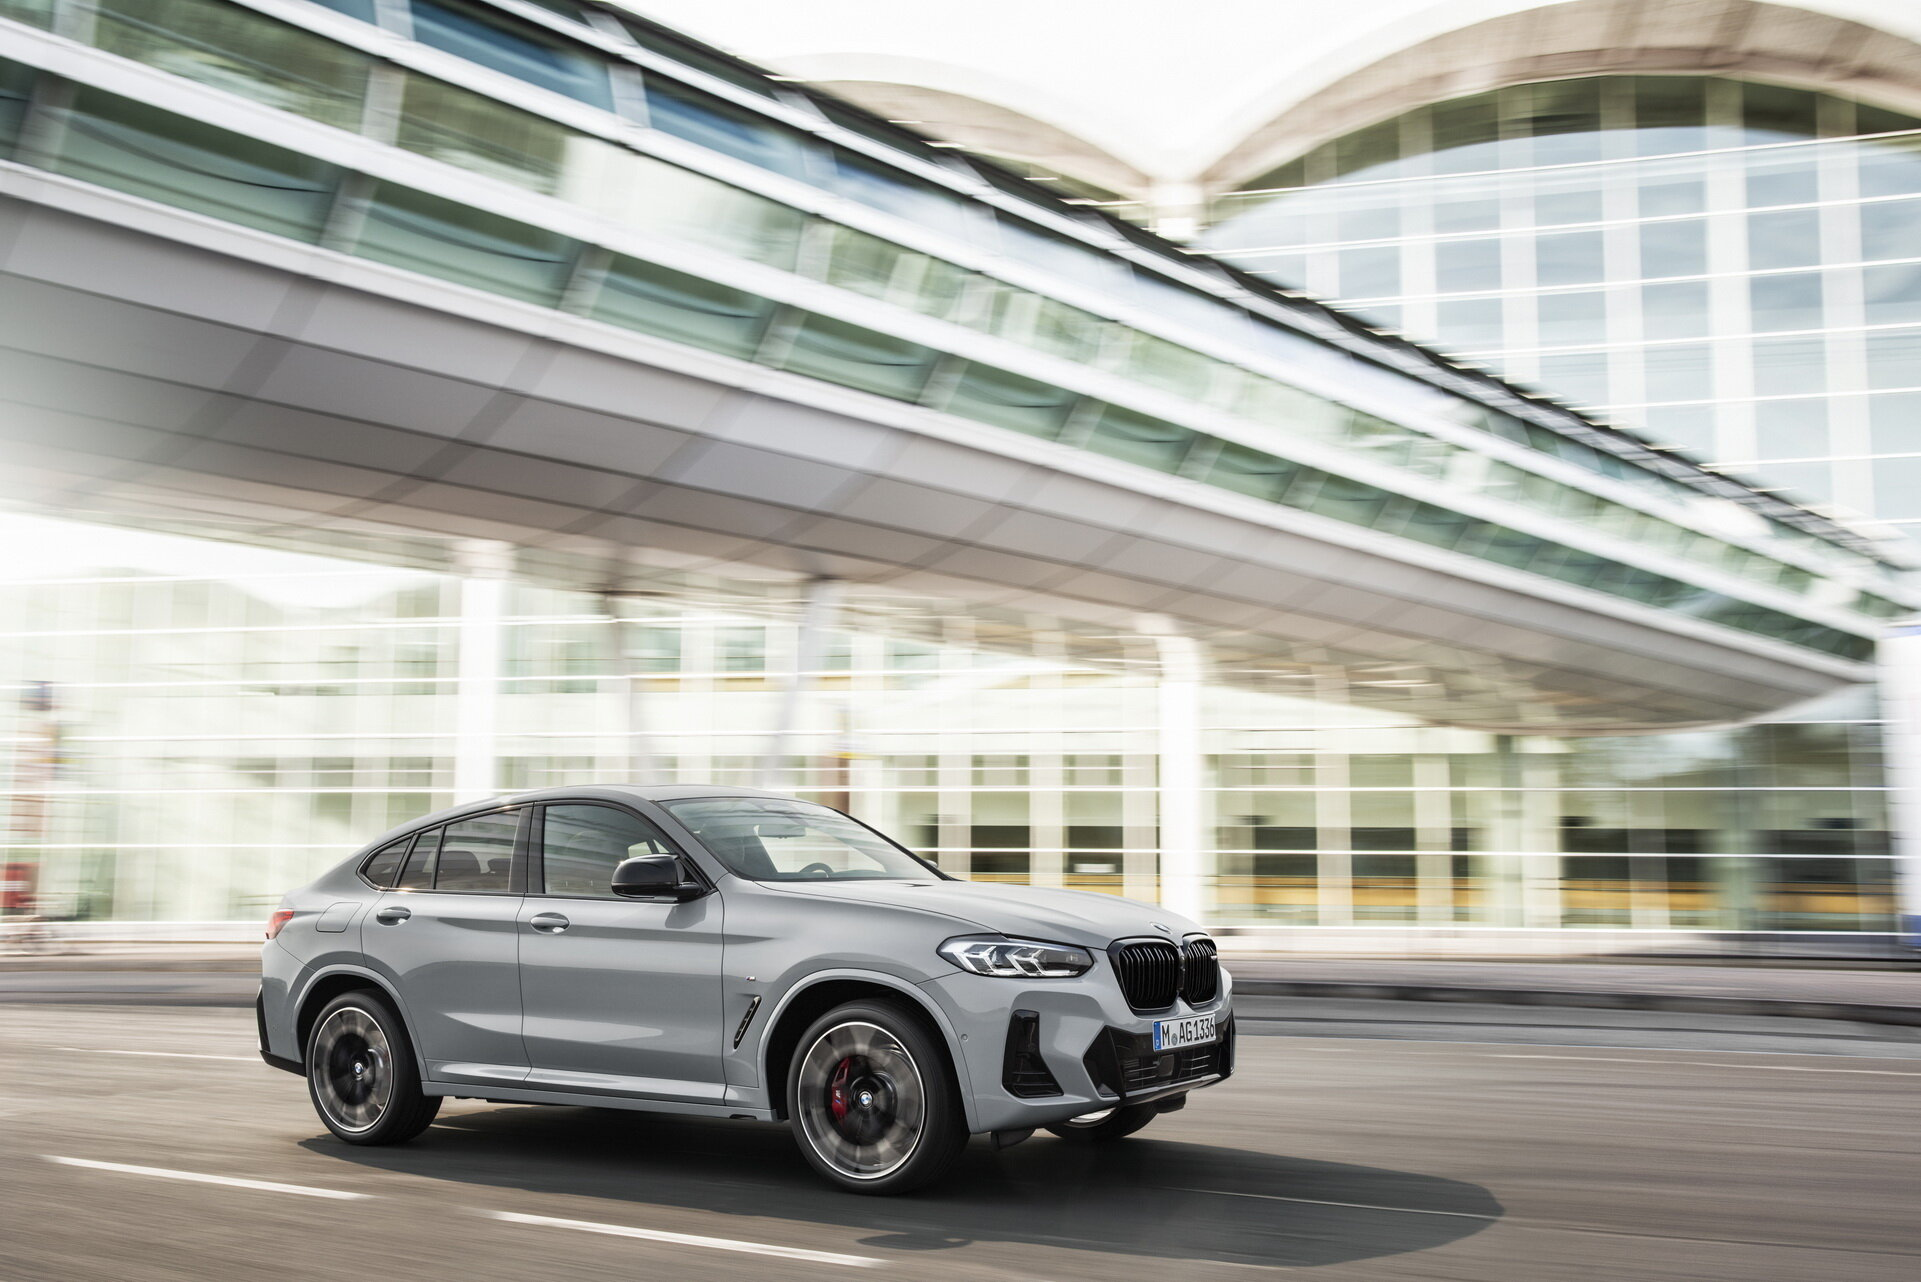 2022-BMW-X3-X4-33.jpg